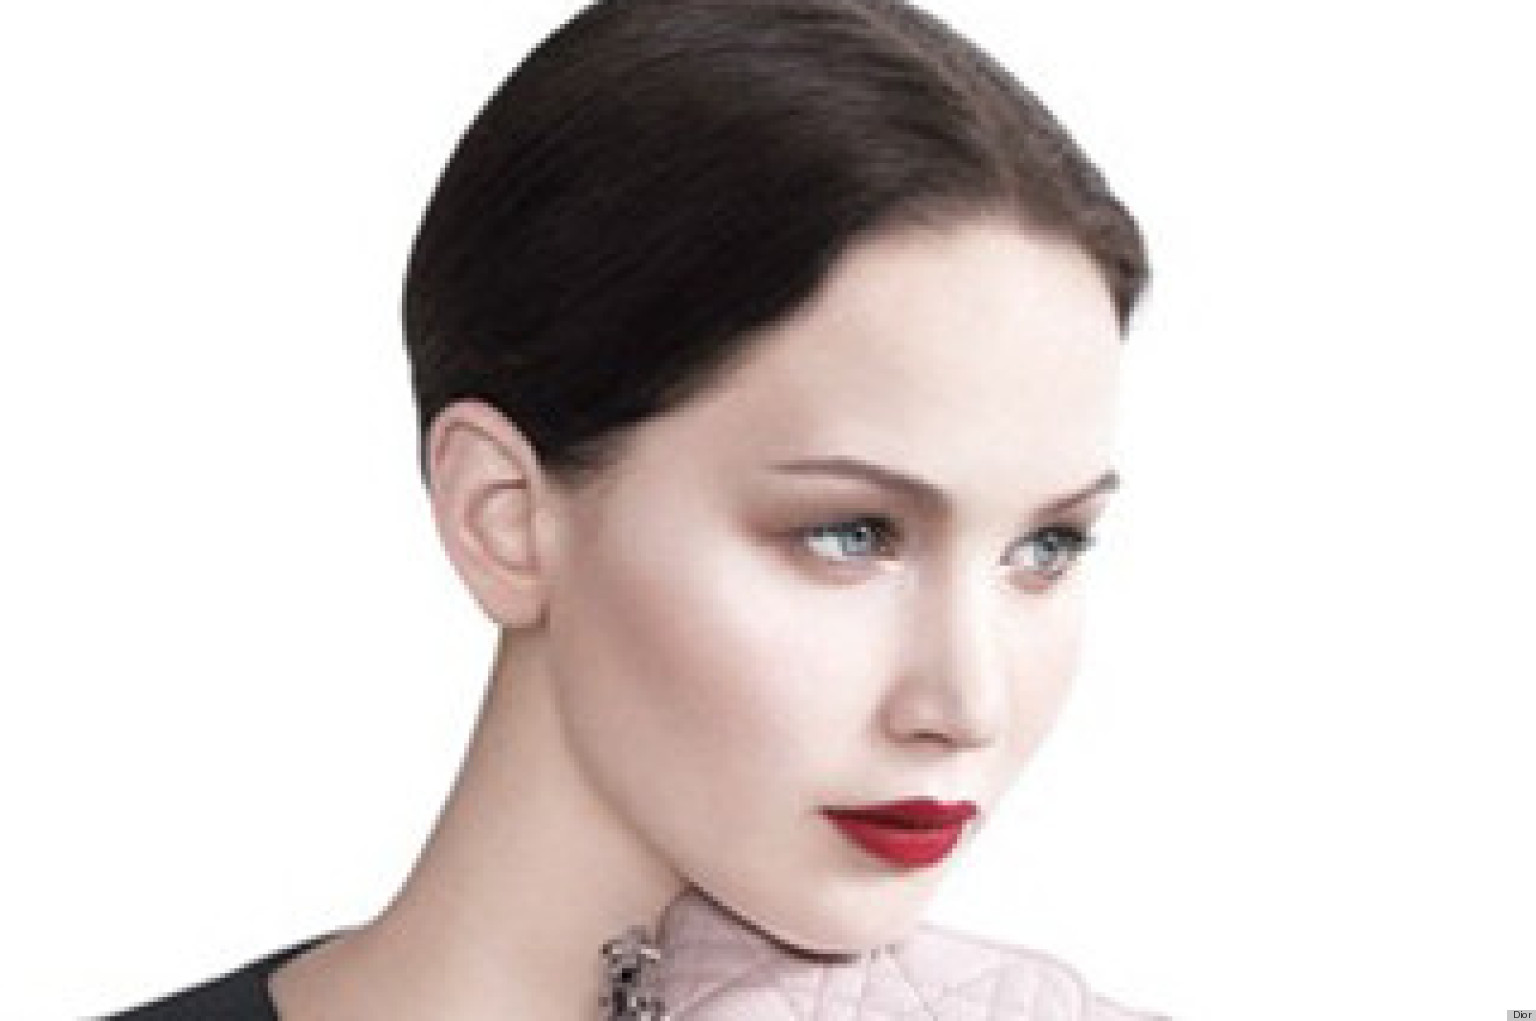 Jennifer Lawrence Dior Ads N 2740330